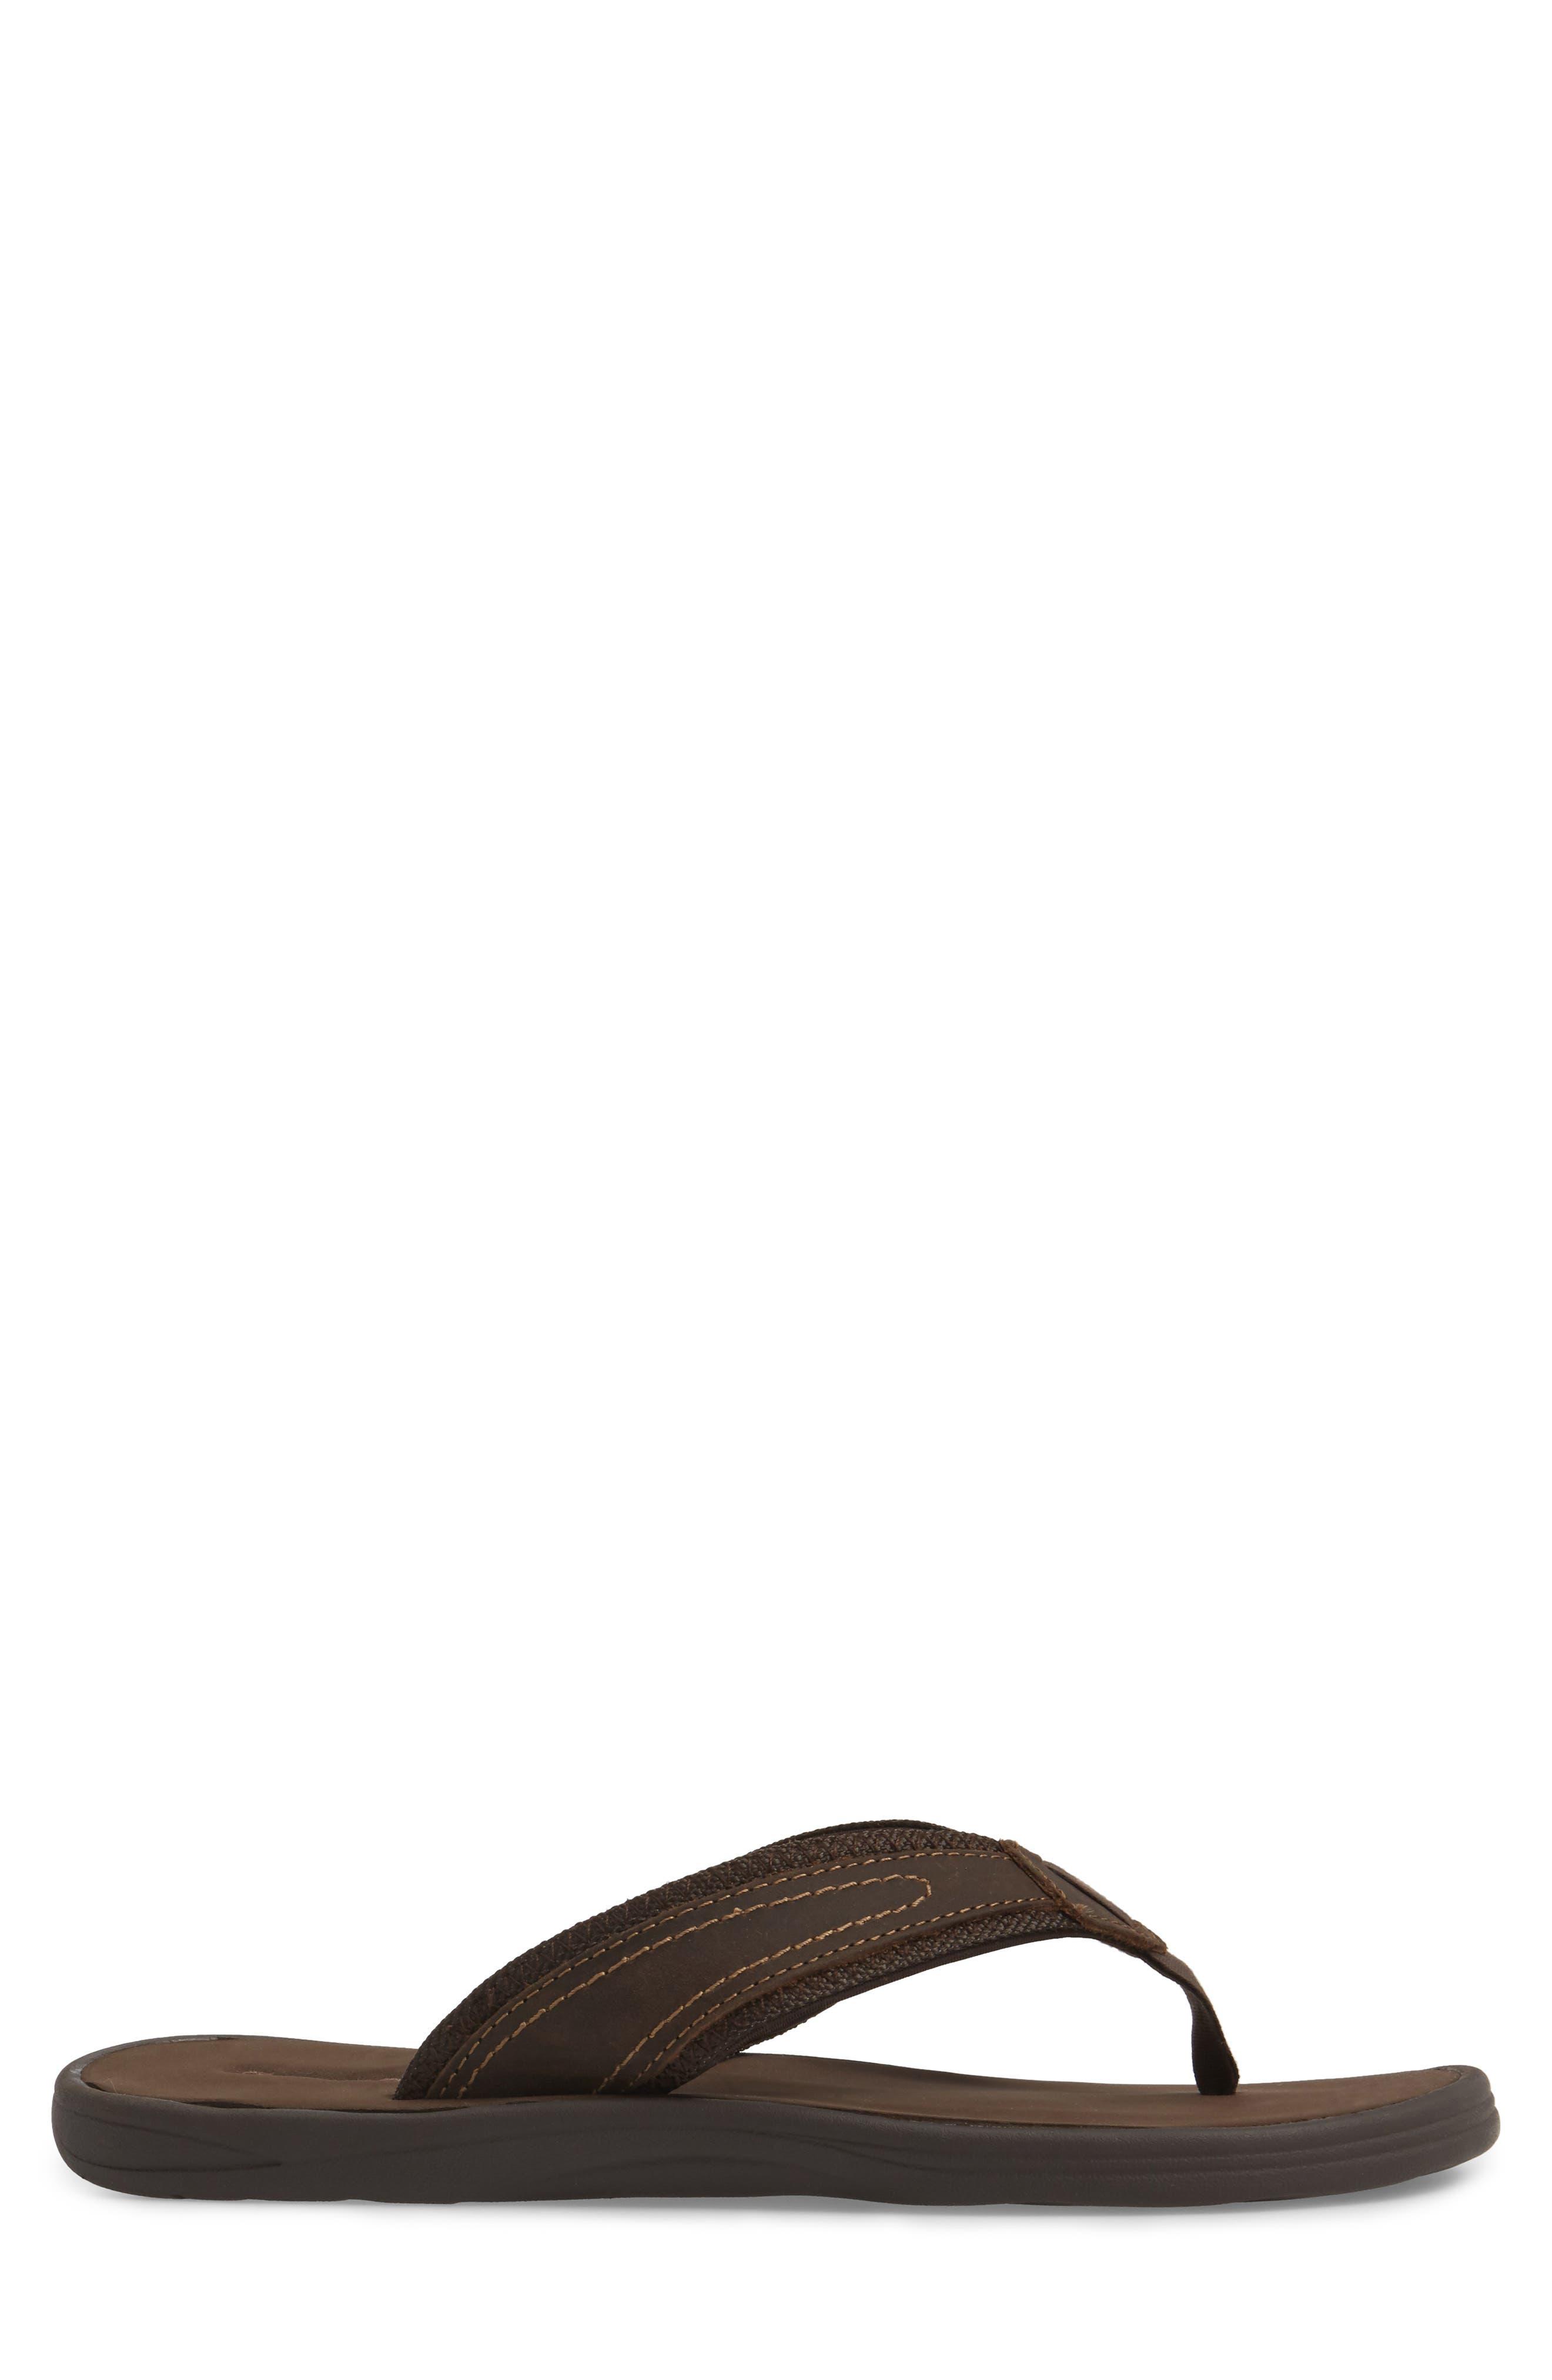 Seawell Flip Flop,                             Alternate thumbnail 3, color,                             Dark Brown Leather